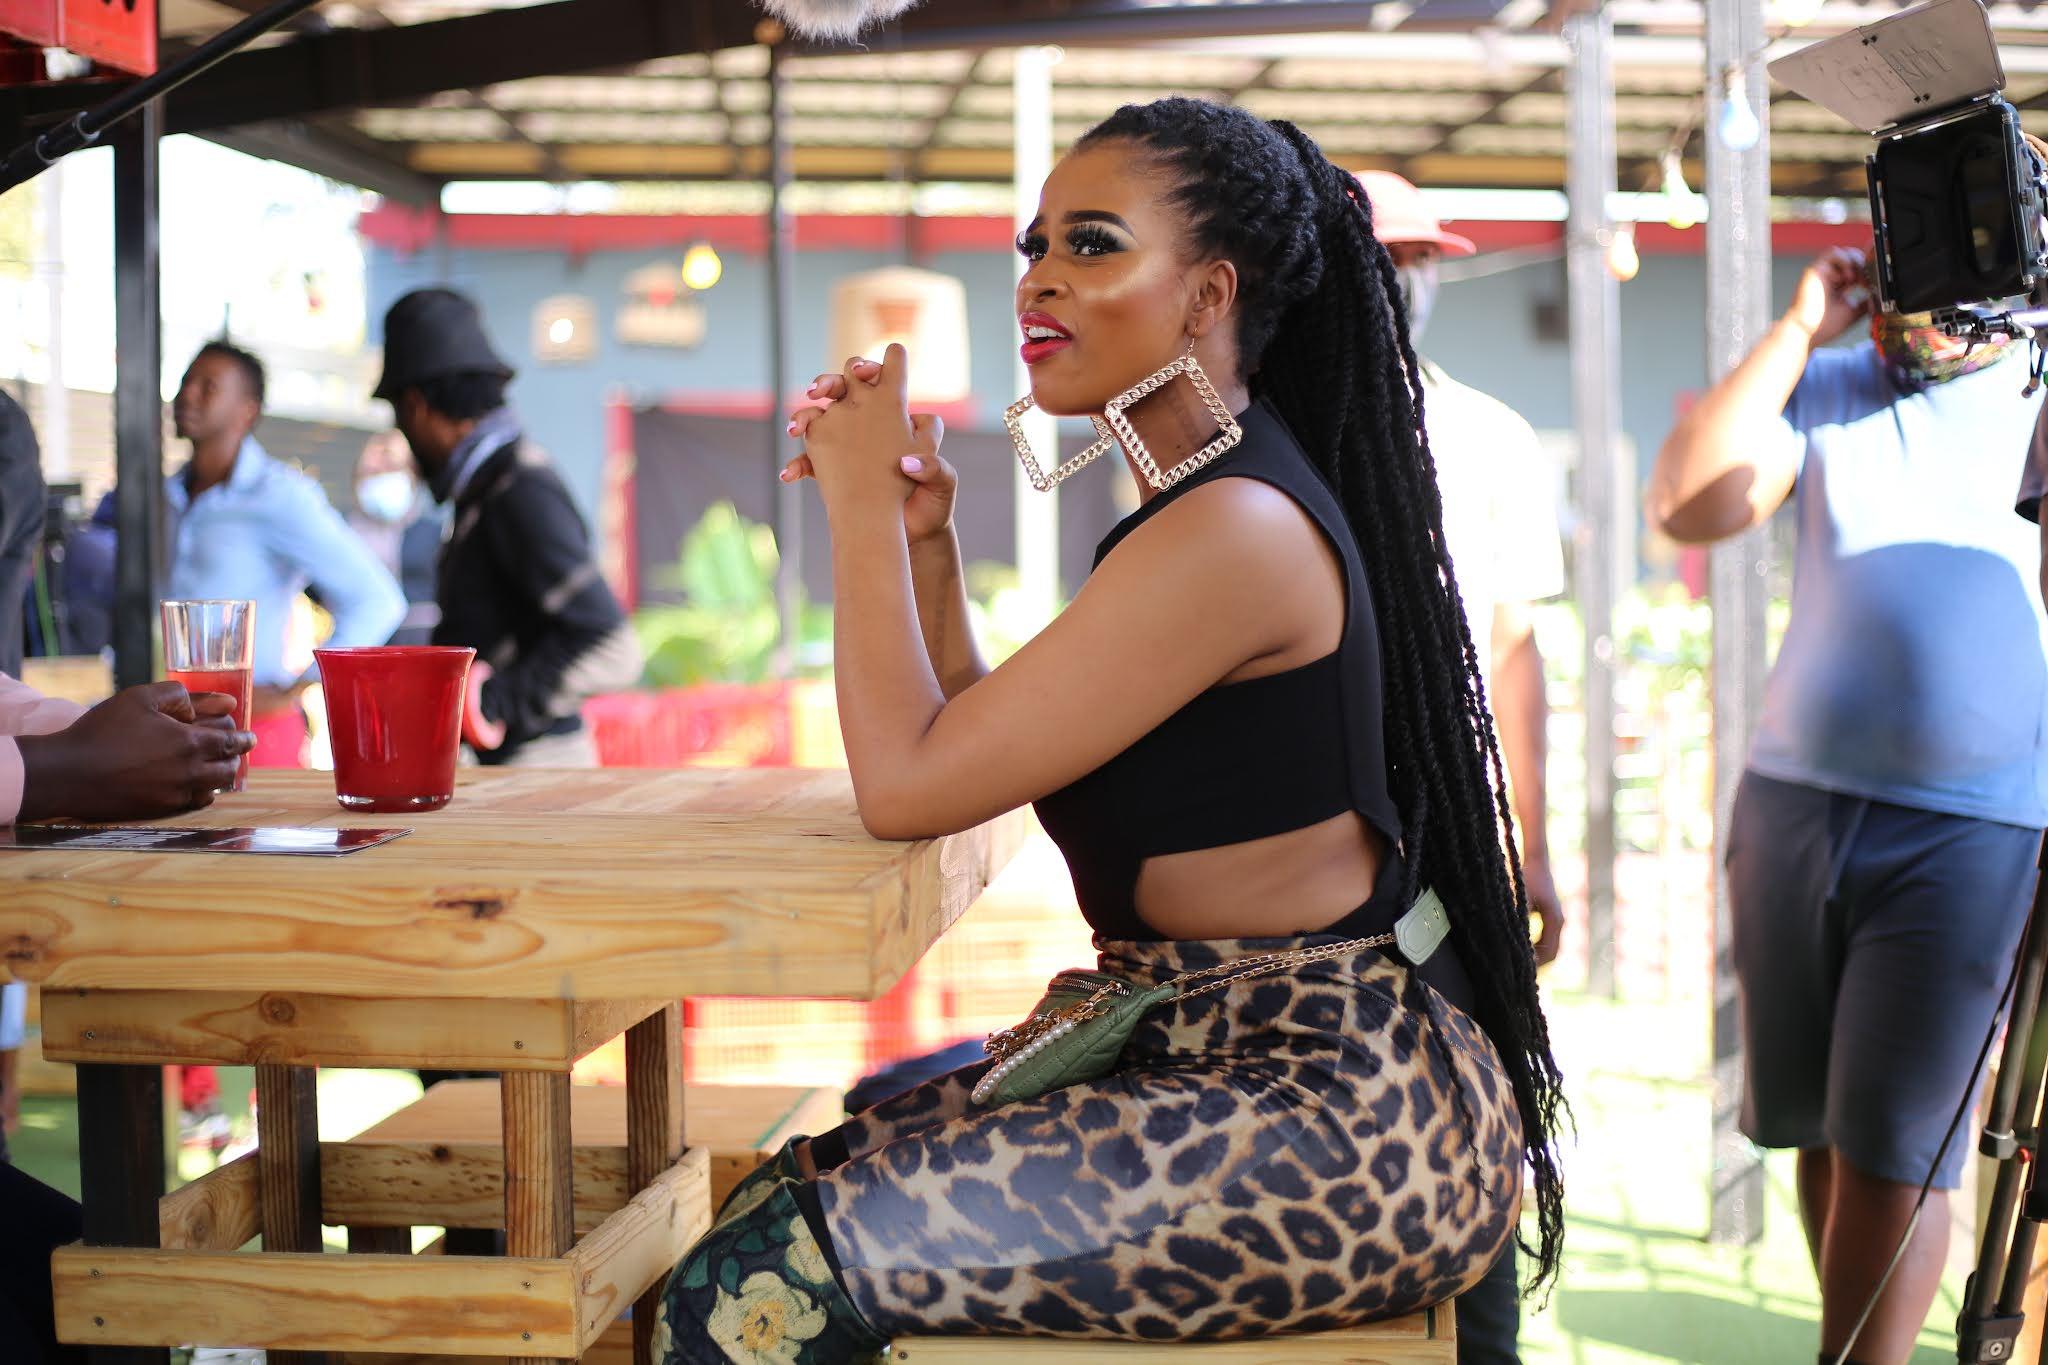 Get to know one of Uzalo's most educated actresses Cocoa 'Nomalanga Shabane'